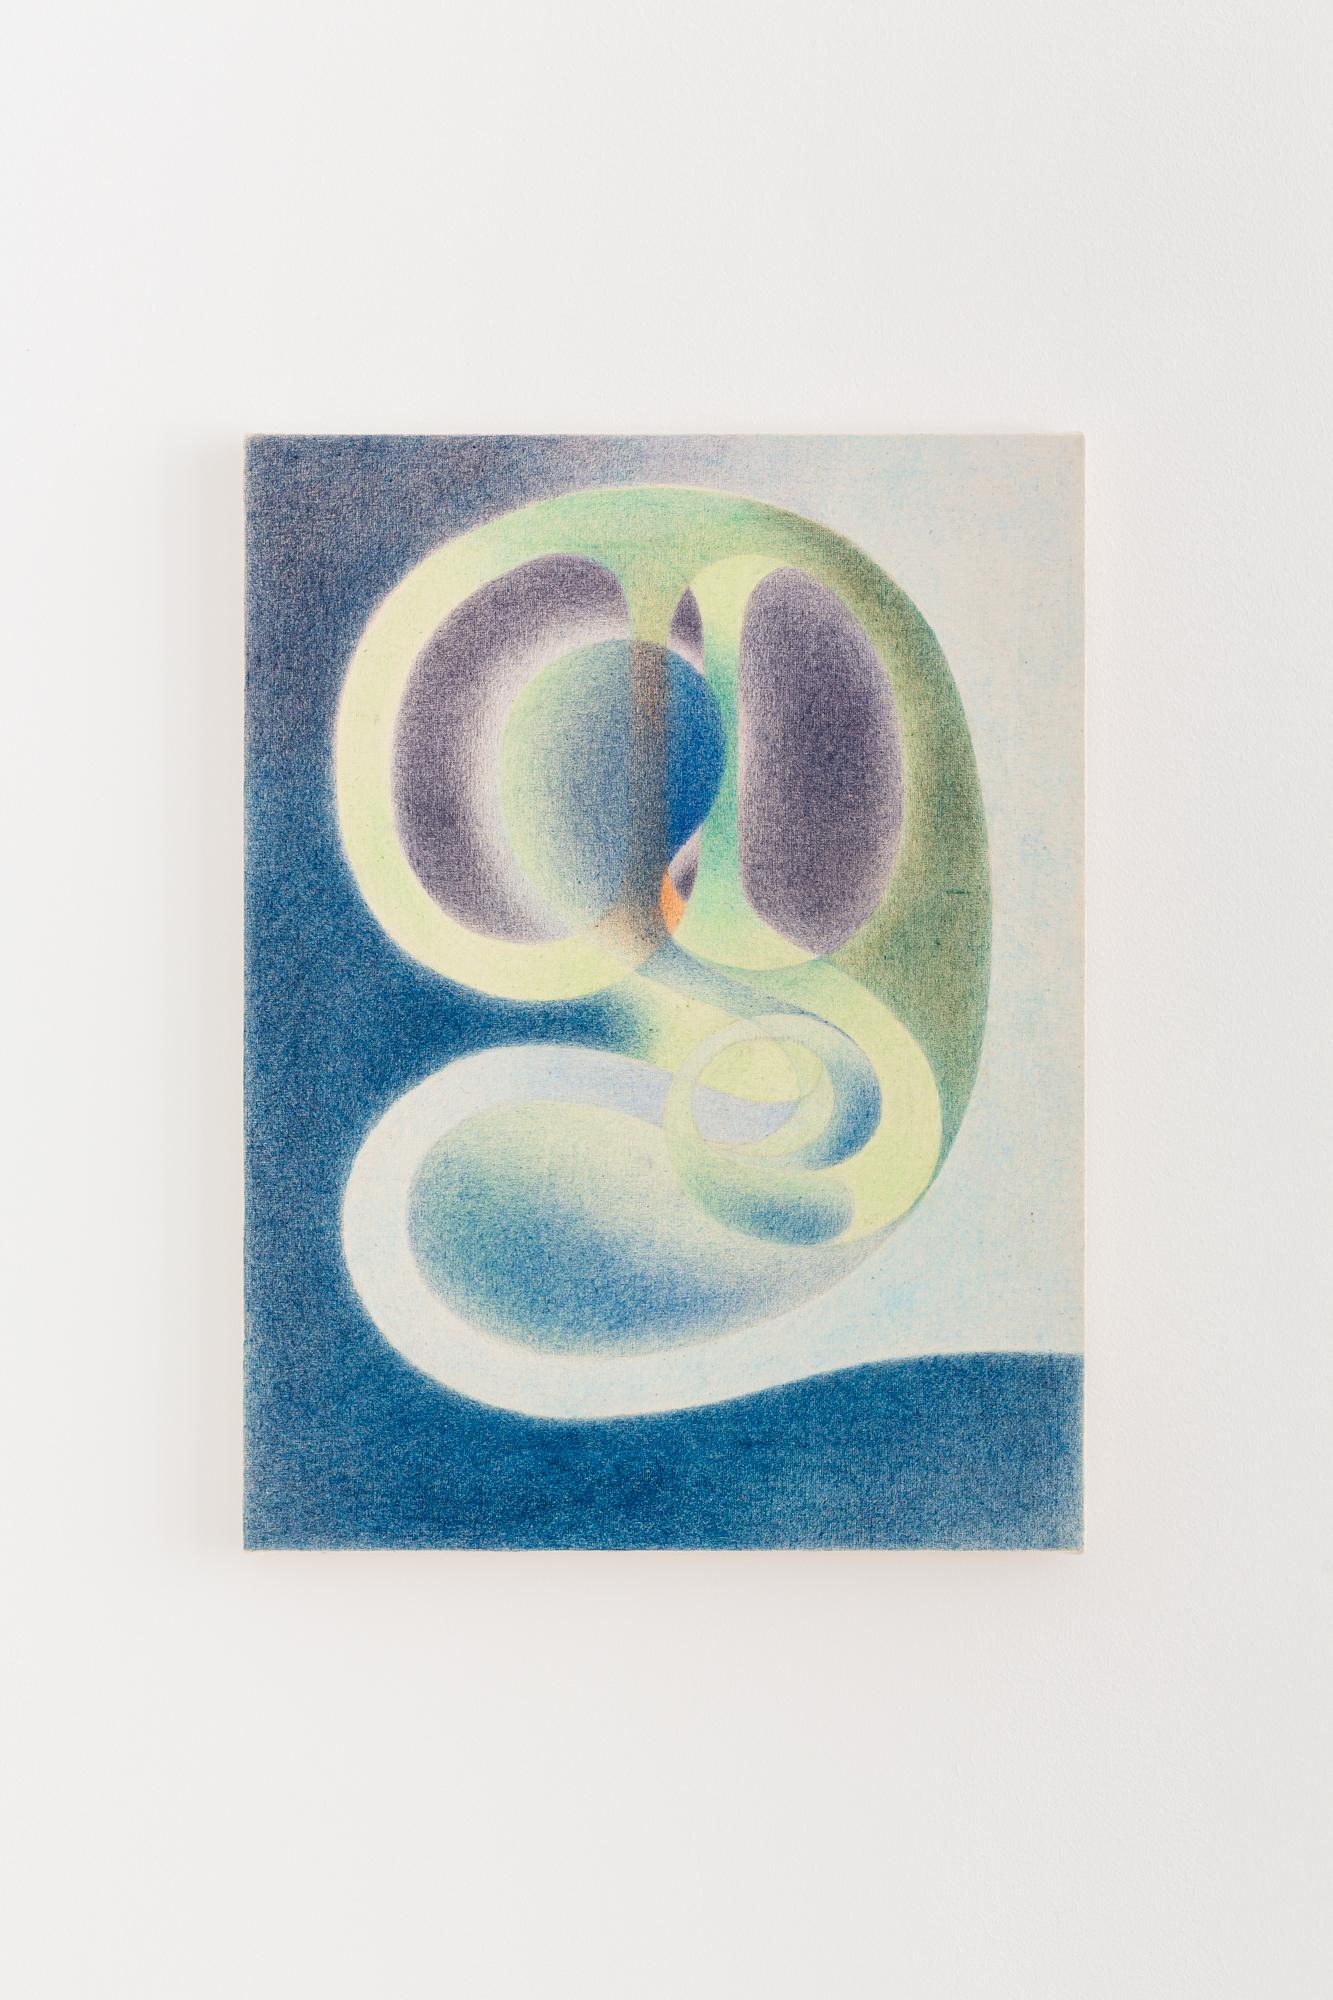 Maren Karlson Viriditas Lápiz sobre lienzo. (48,2x35,5 cm) 2020